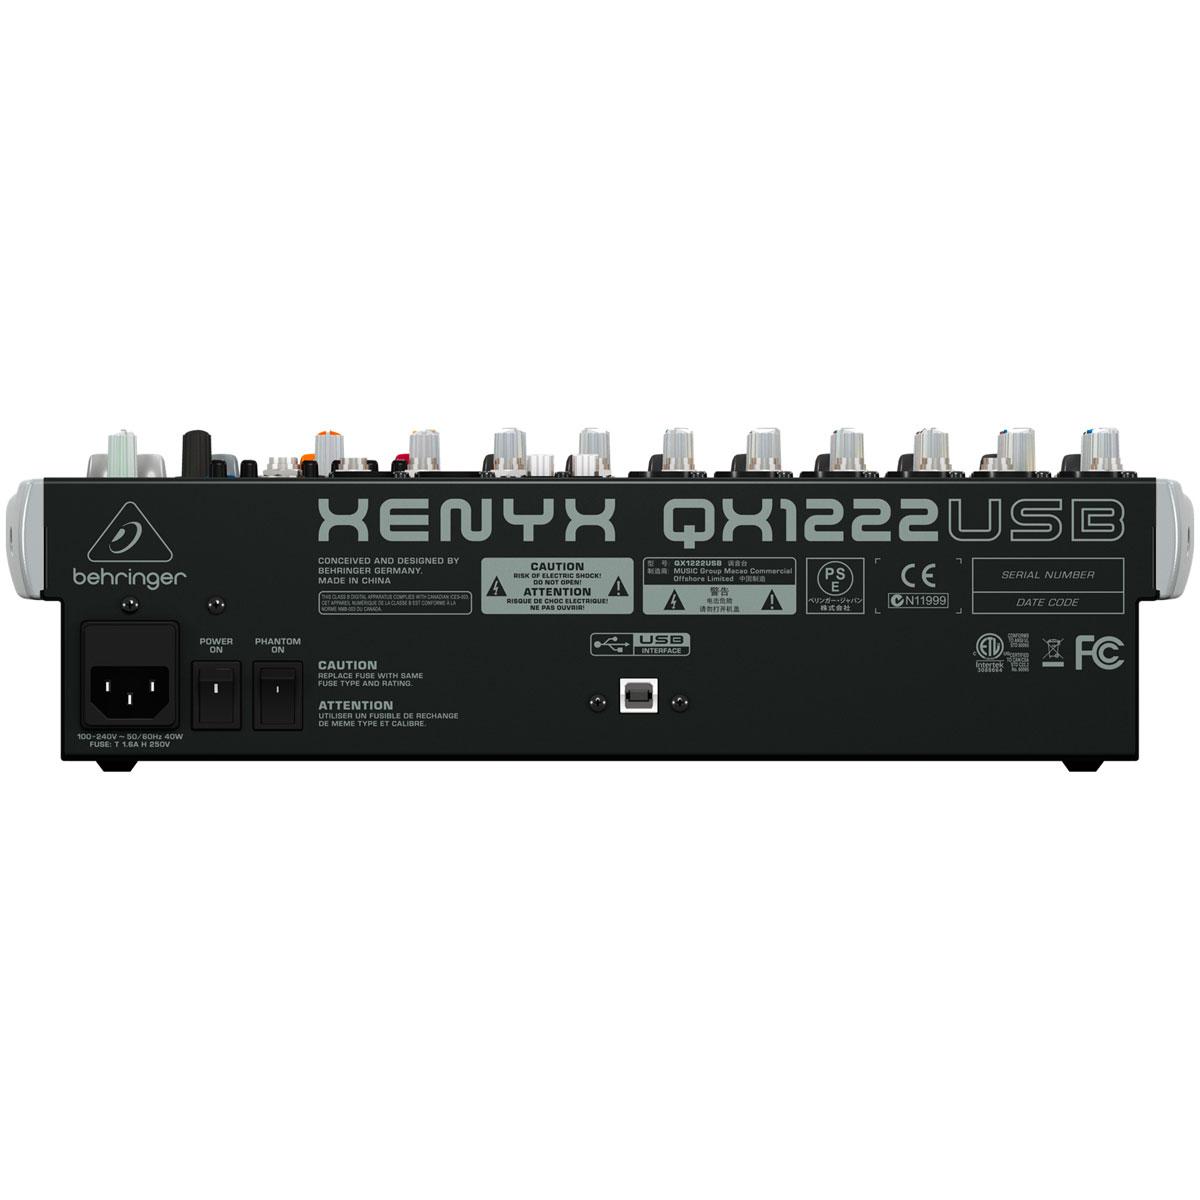 Mesa de Som 12 Canais (6 XLR + 2 P10 Balanceados + 4 P10 Desbalanceados) c/ USB / Efeito / Phantom / 2 Auxiliares - Xenyx QX 1222 USB Behringer